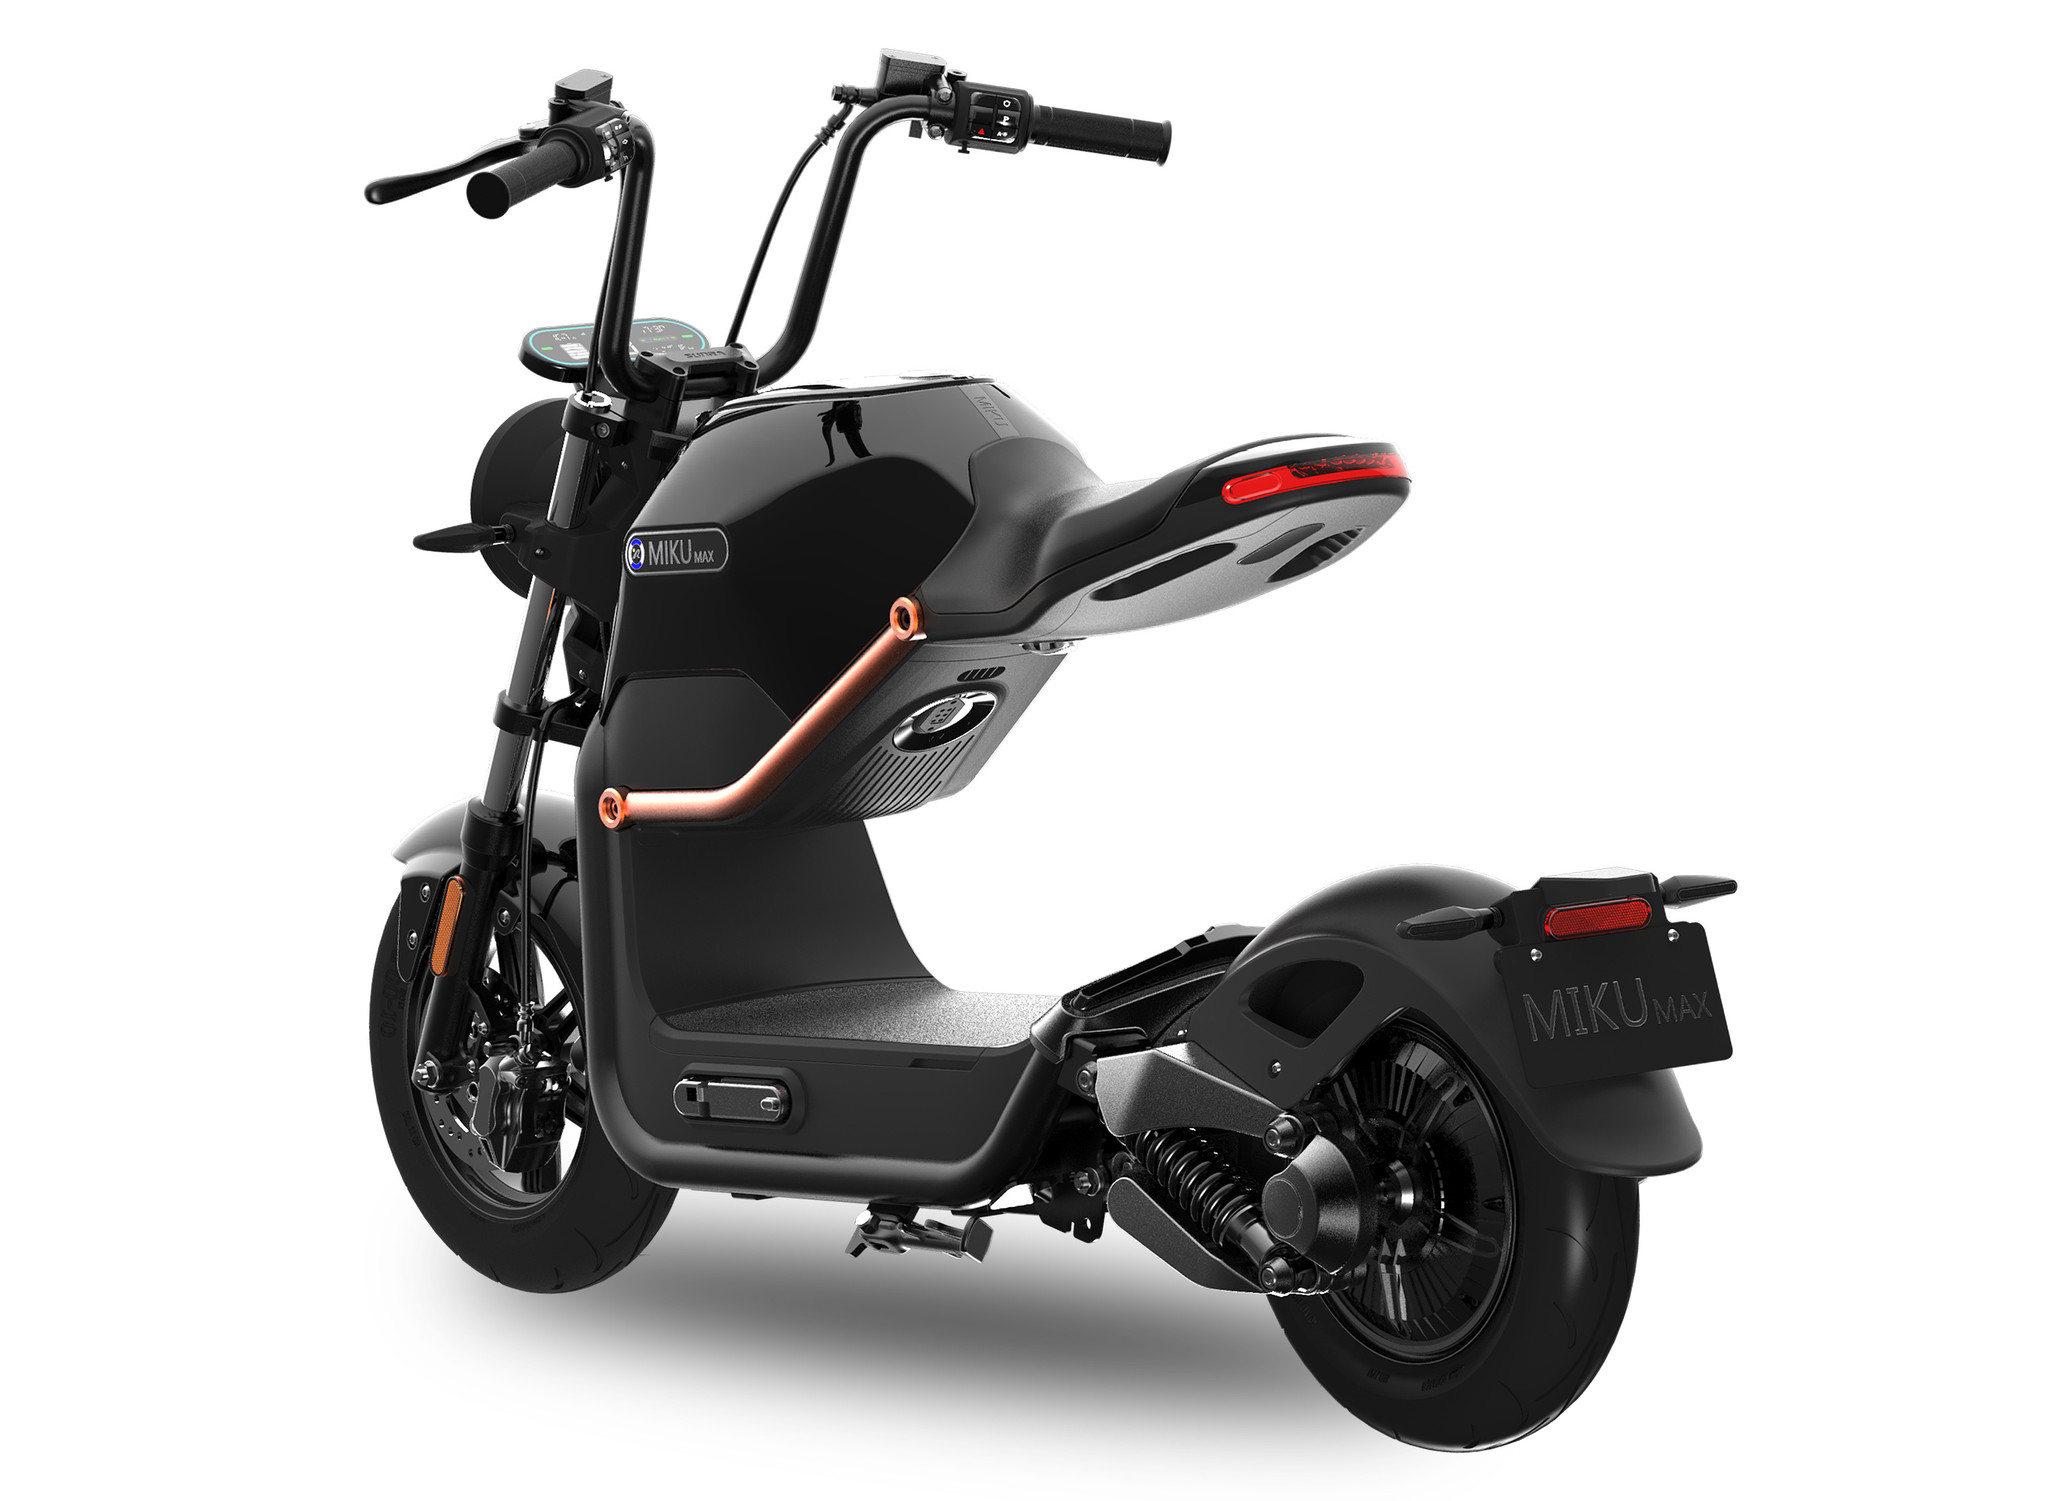 Nitro Elektro Scooter E Roller Mofa Miku Max mit Straßenzulassung